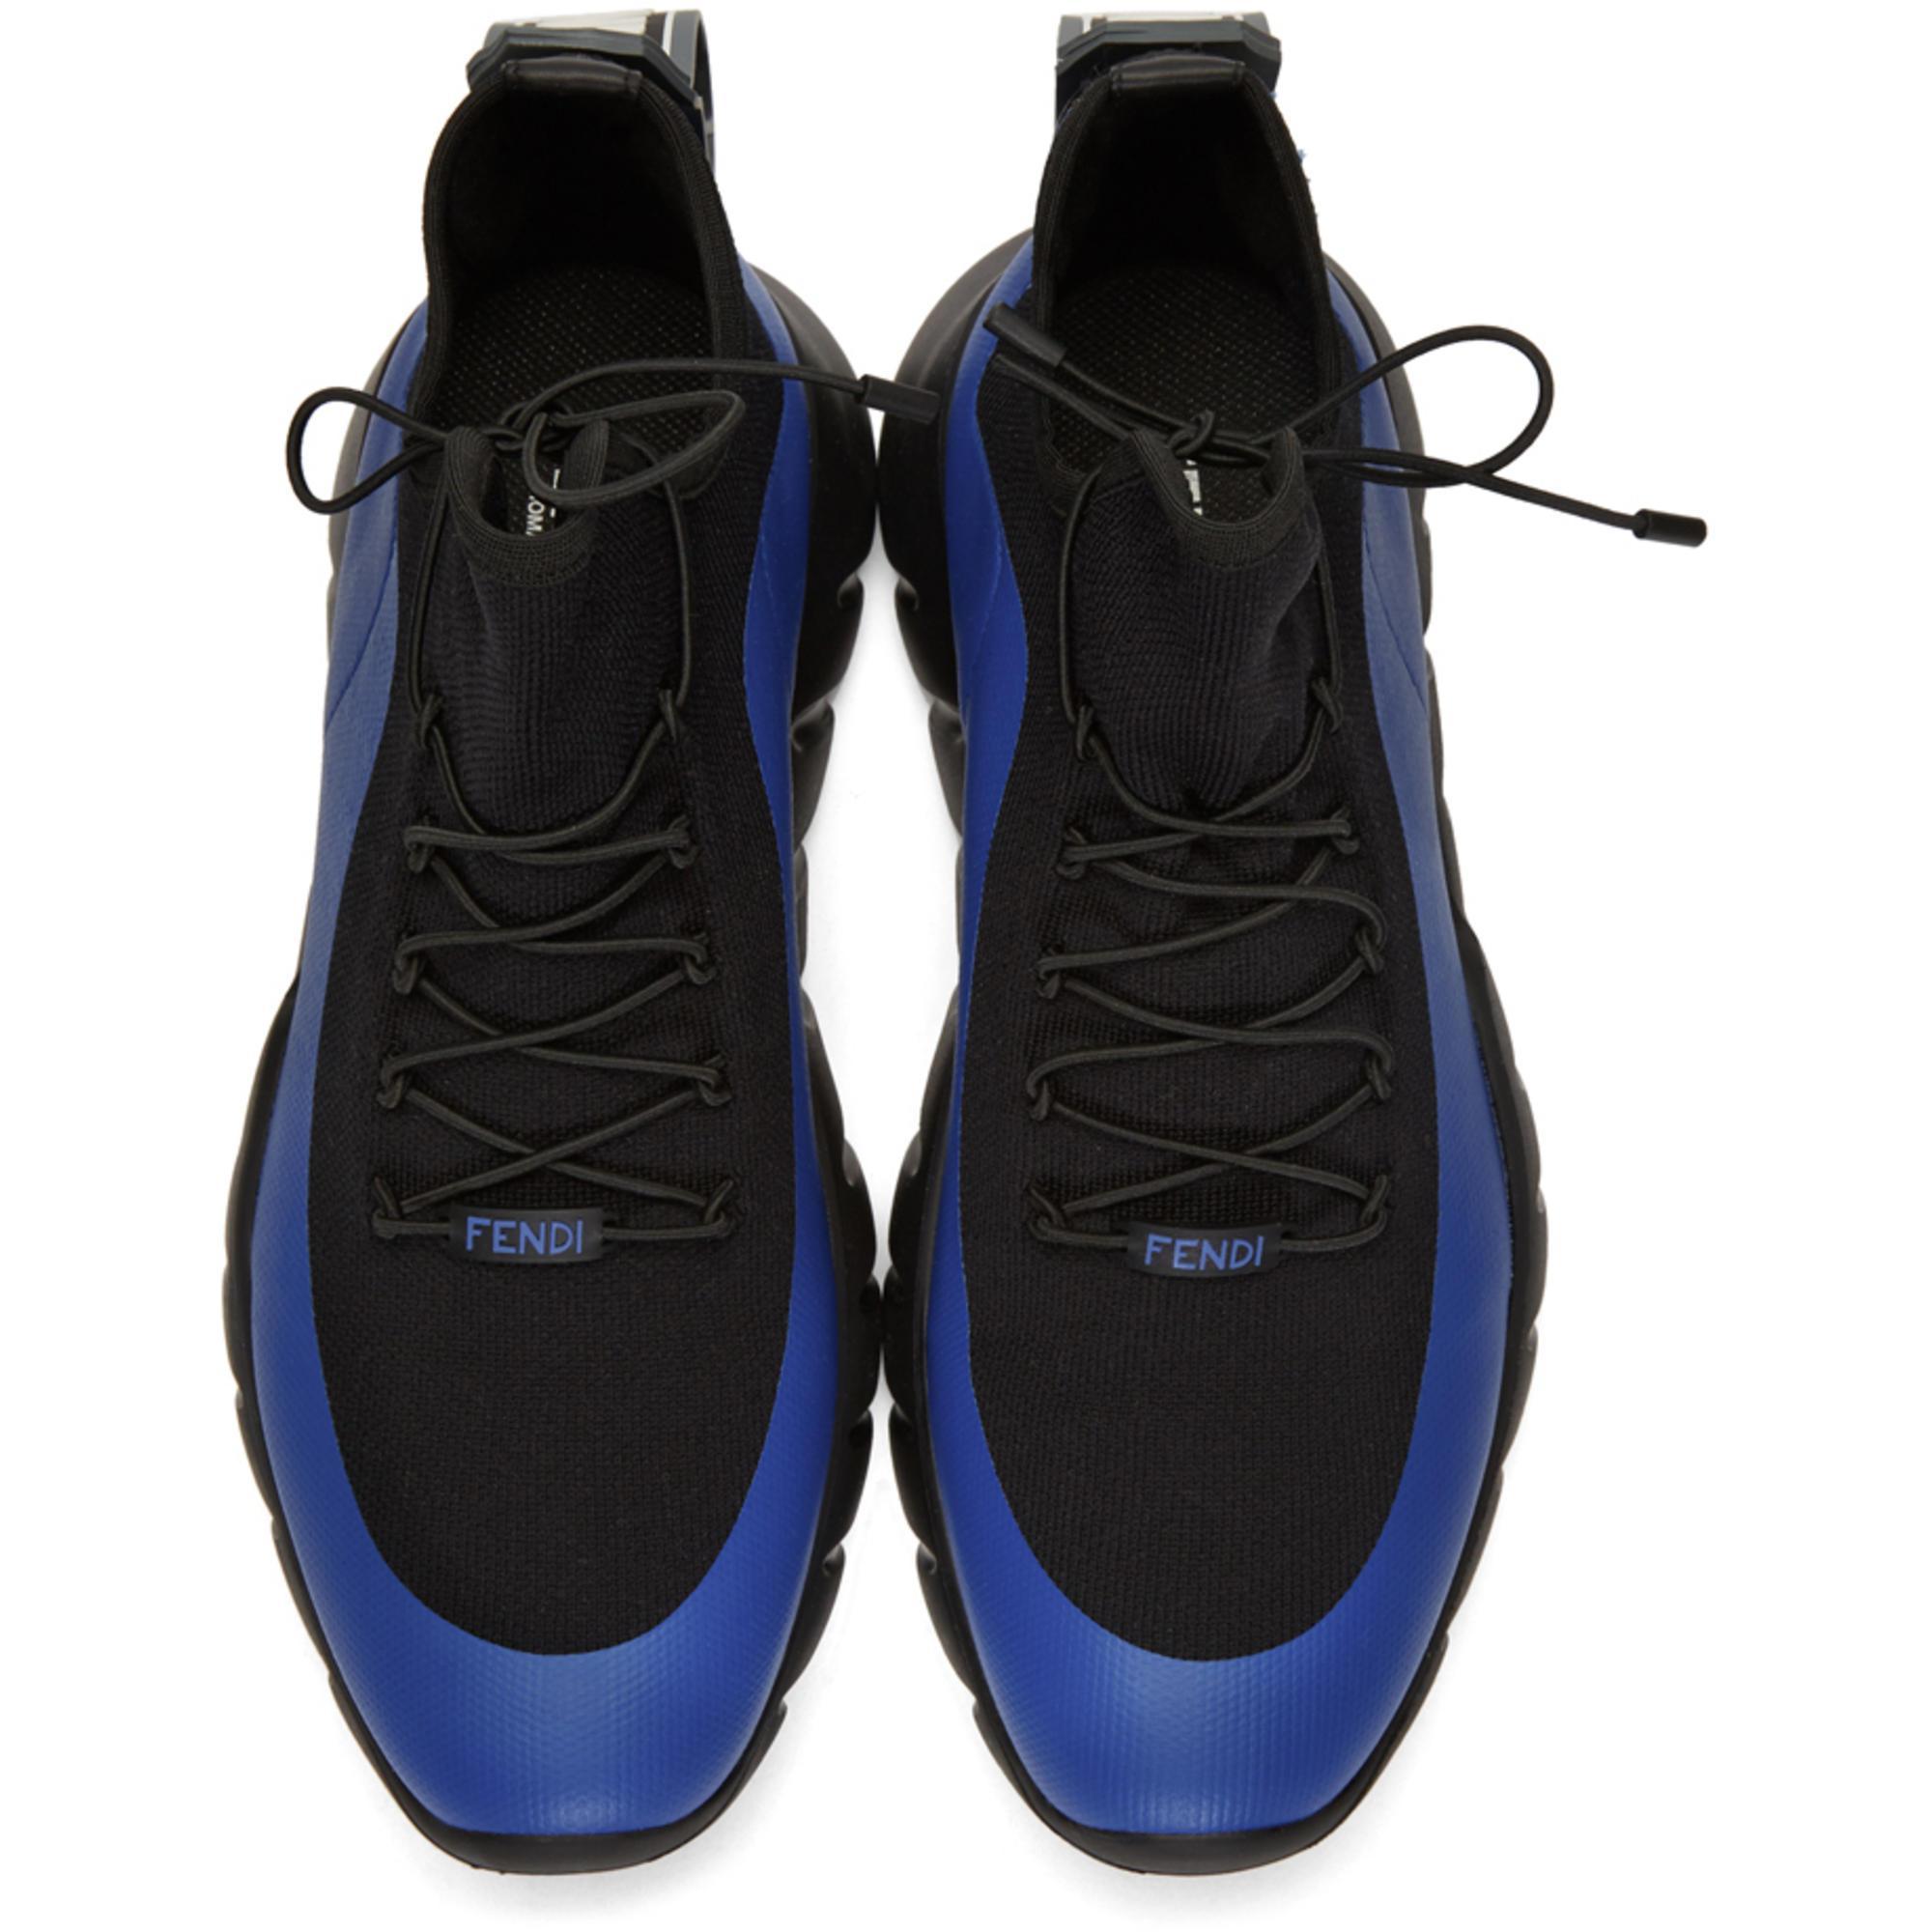 Fendi & ' Vocabulary' Running Sneakers Free Shipping Enjoy FwaJ1tHf5R